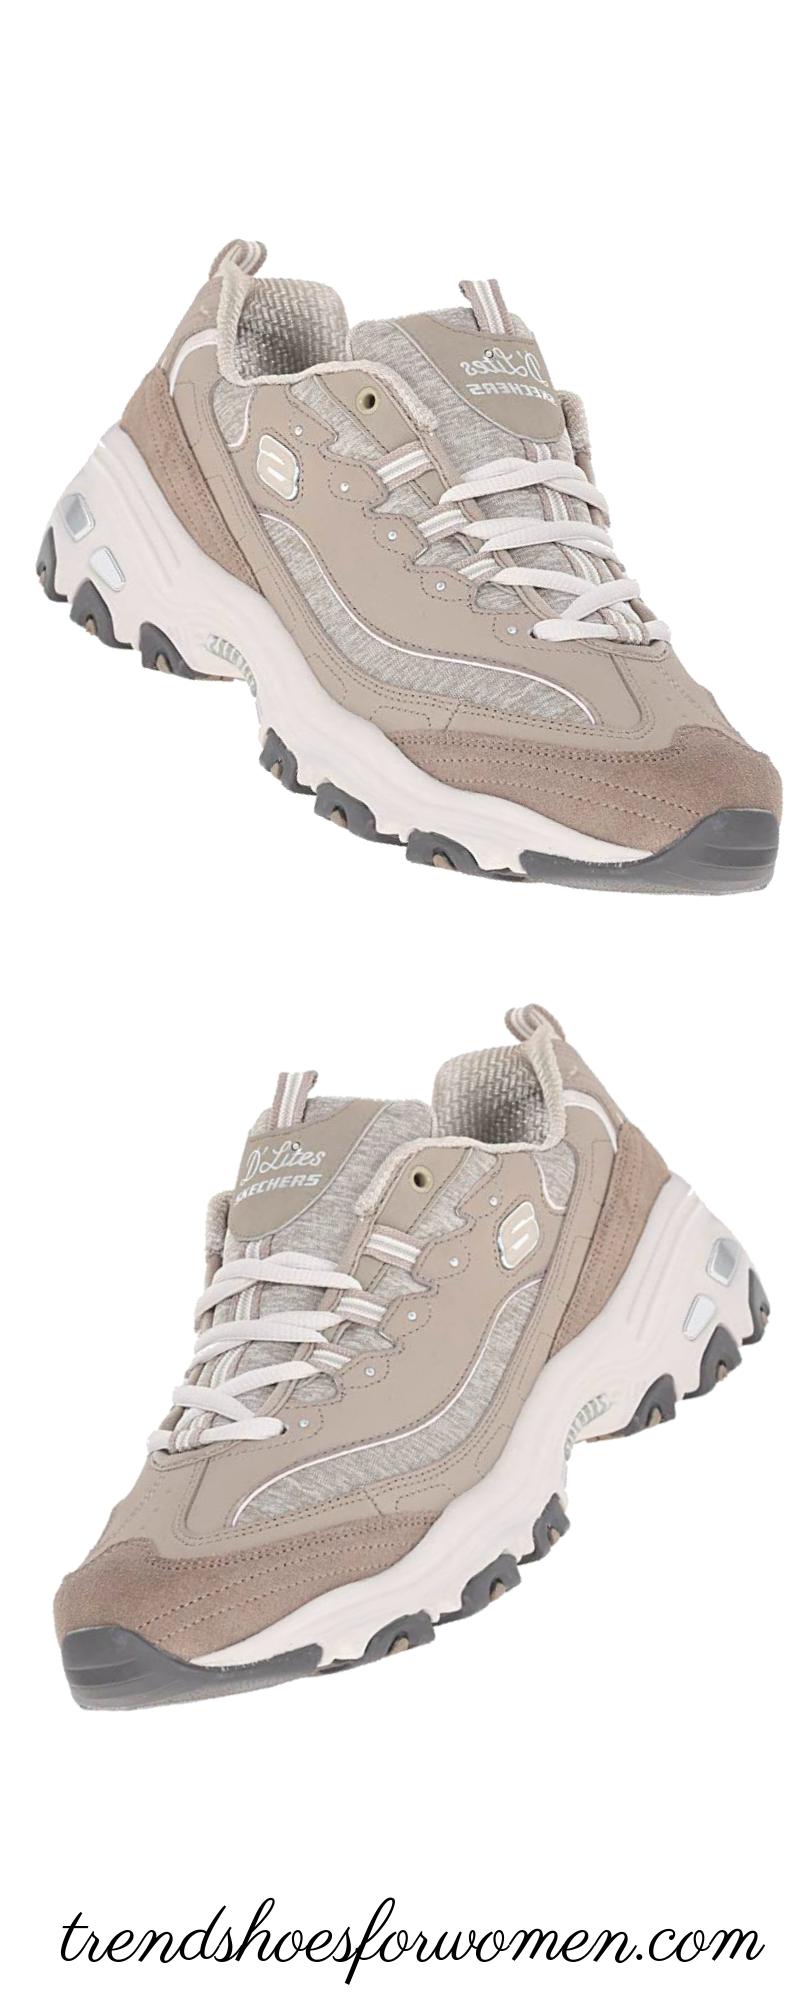 2a7feeba0afe6 It is Skechers. It is stylish, comfortable and nice looking. #Skechers  #Skecherswomen #stylish #sneakers #brown